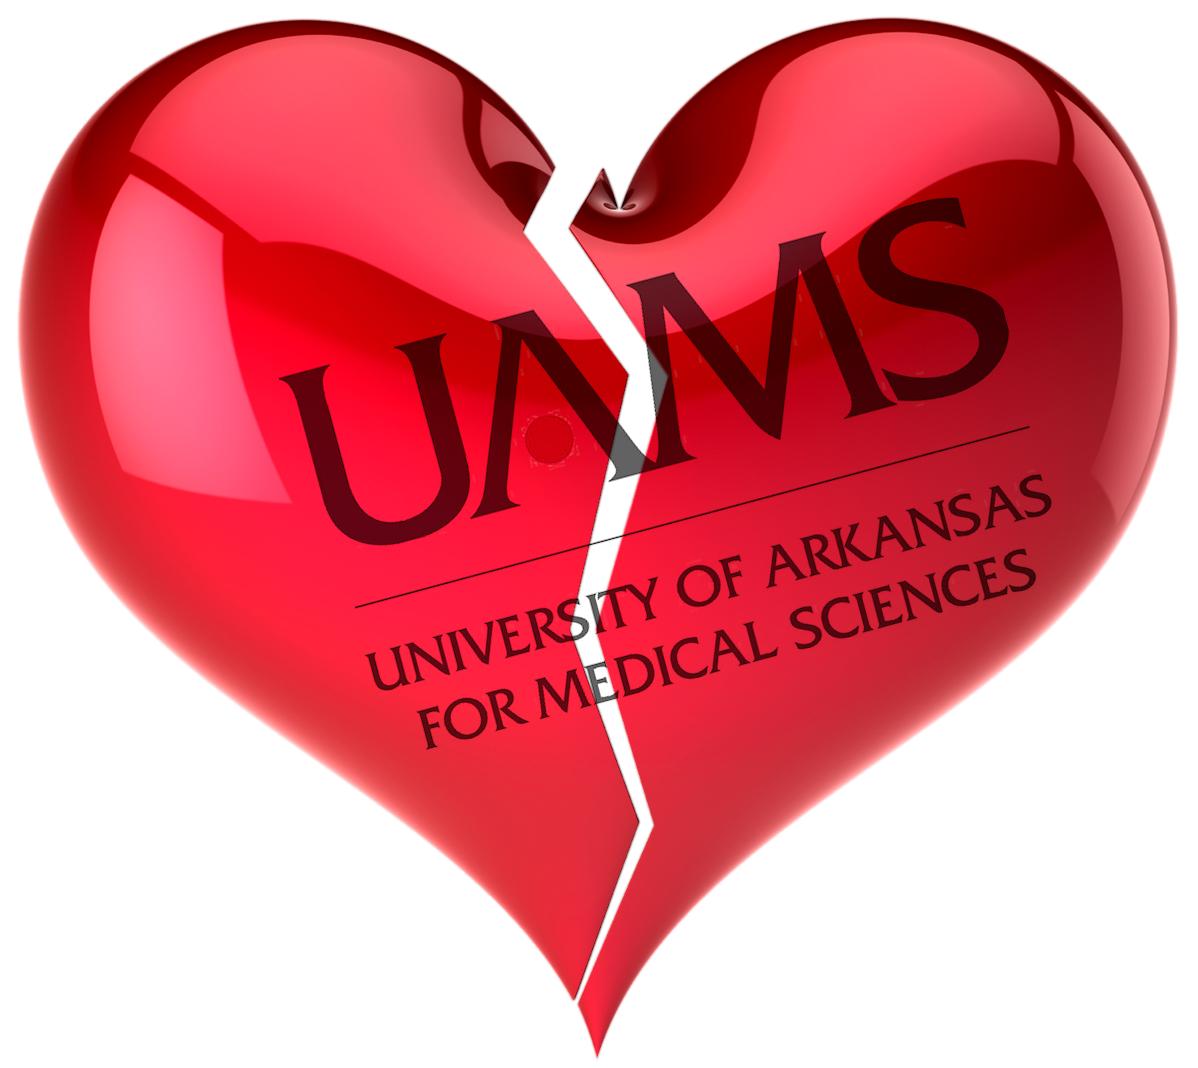 Am I Next? University of Arkansas for Medical Sciences Layoffs